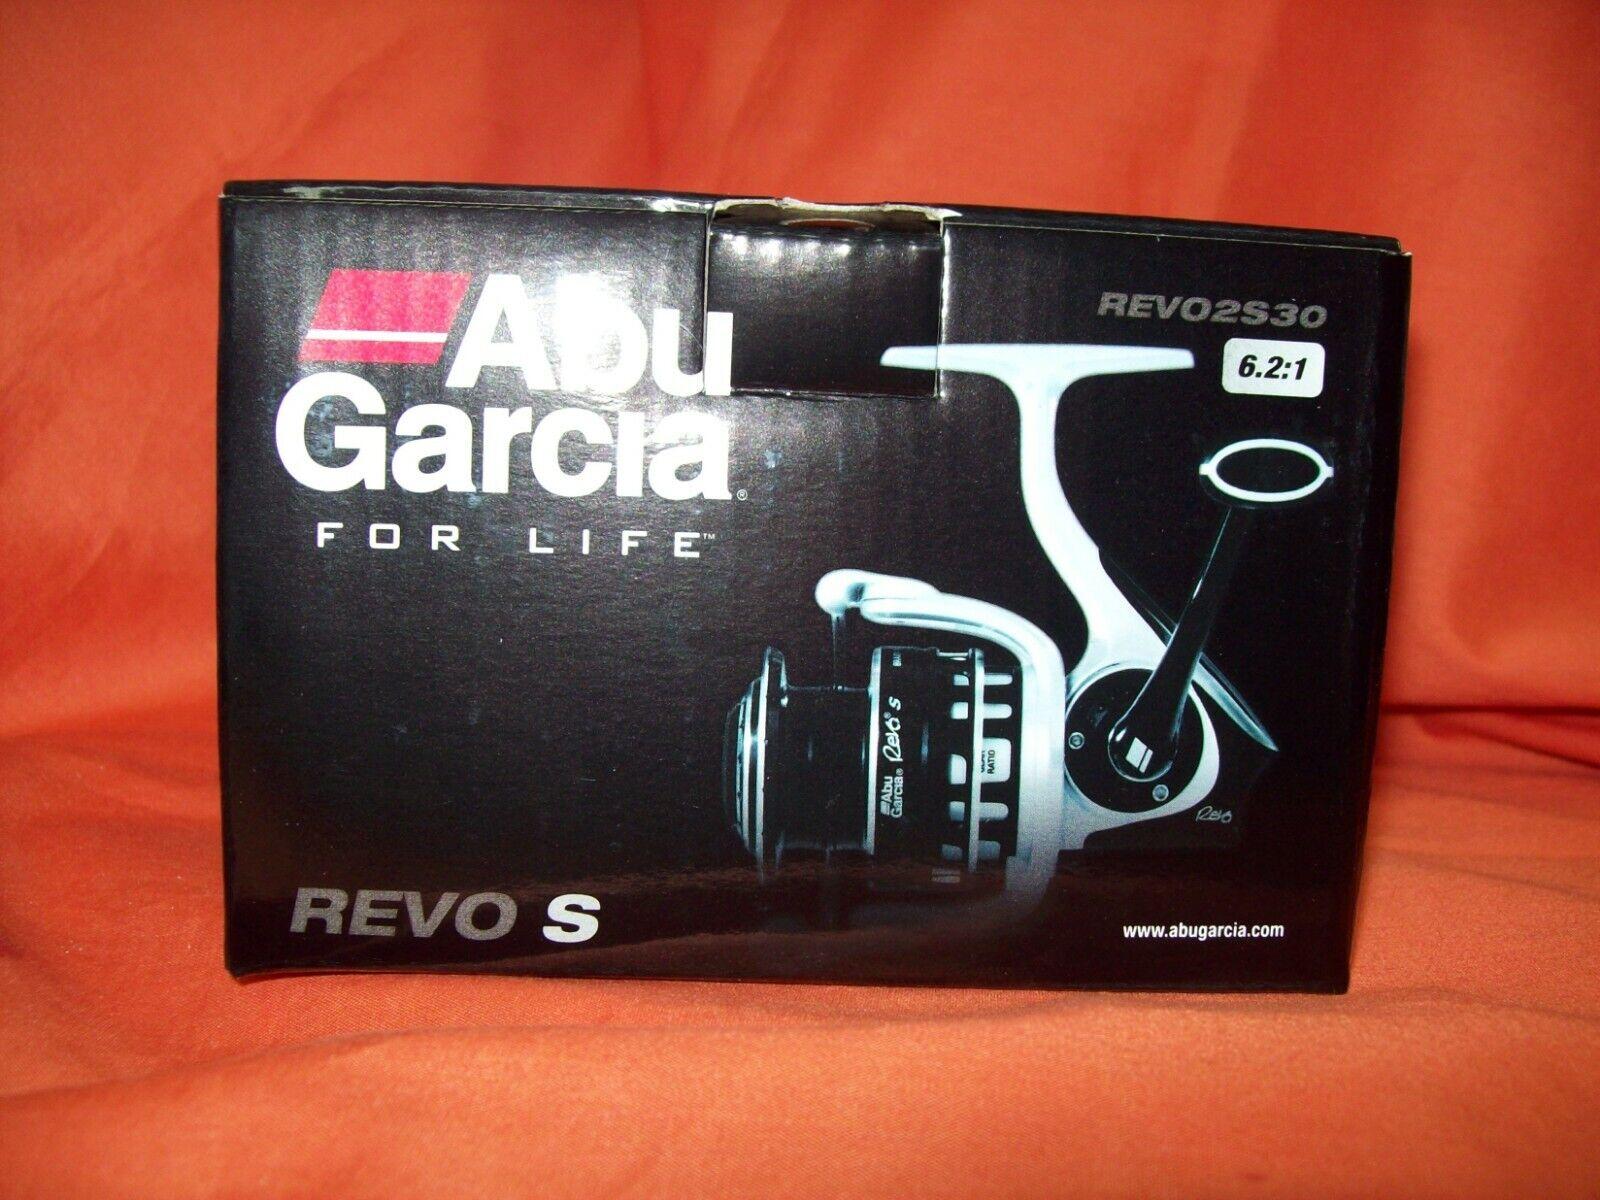 ABU GARCIA REVO S SPINNING REEL 6.2 1 GR REVO2S30 1365353